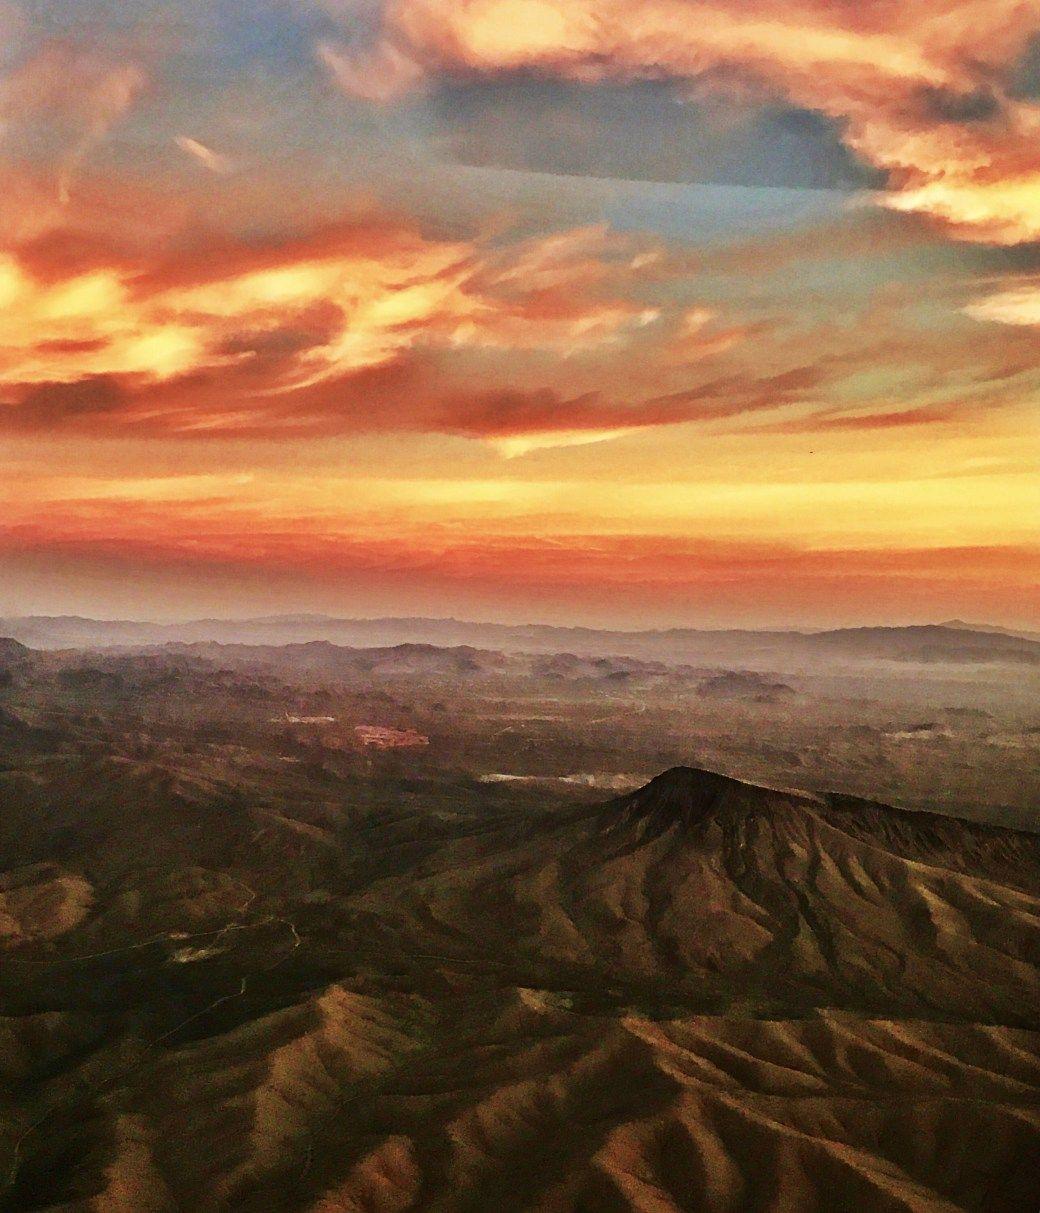 Grand Canyon kompromisset | FiftyFabulous